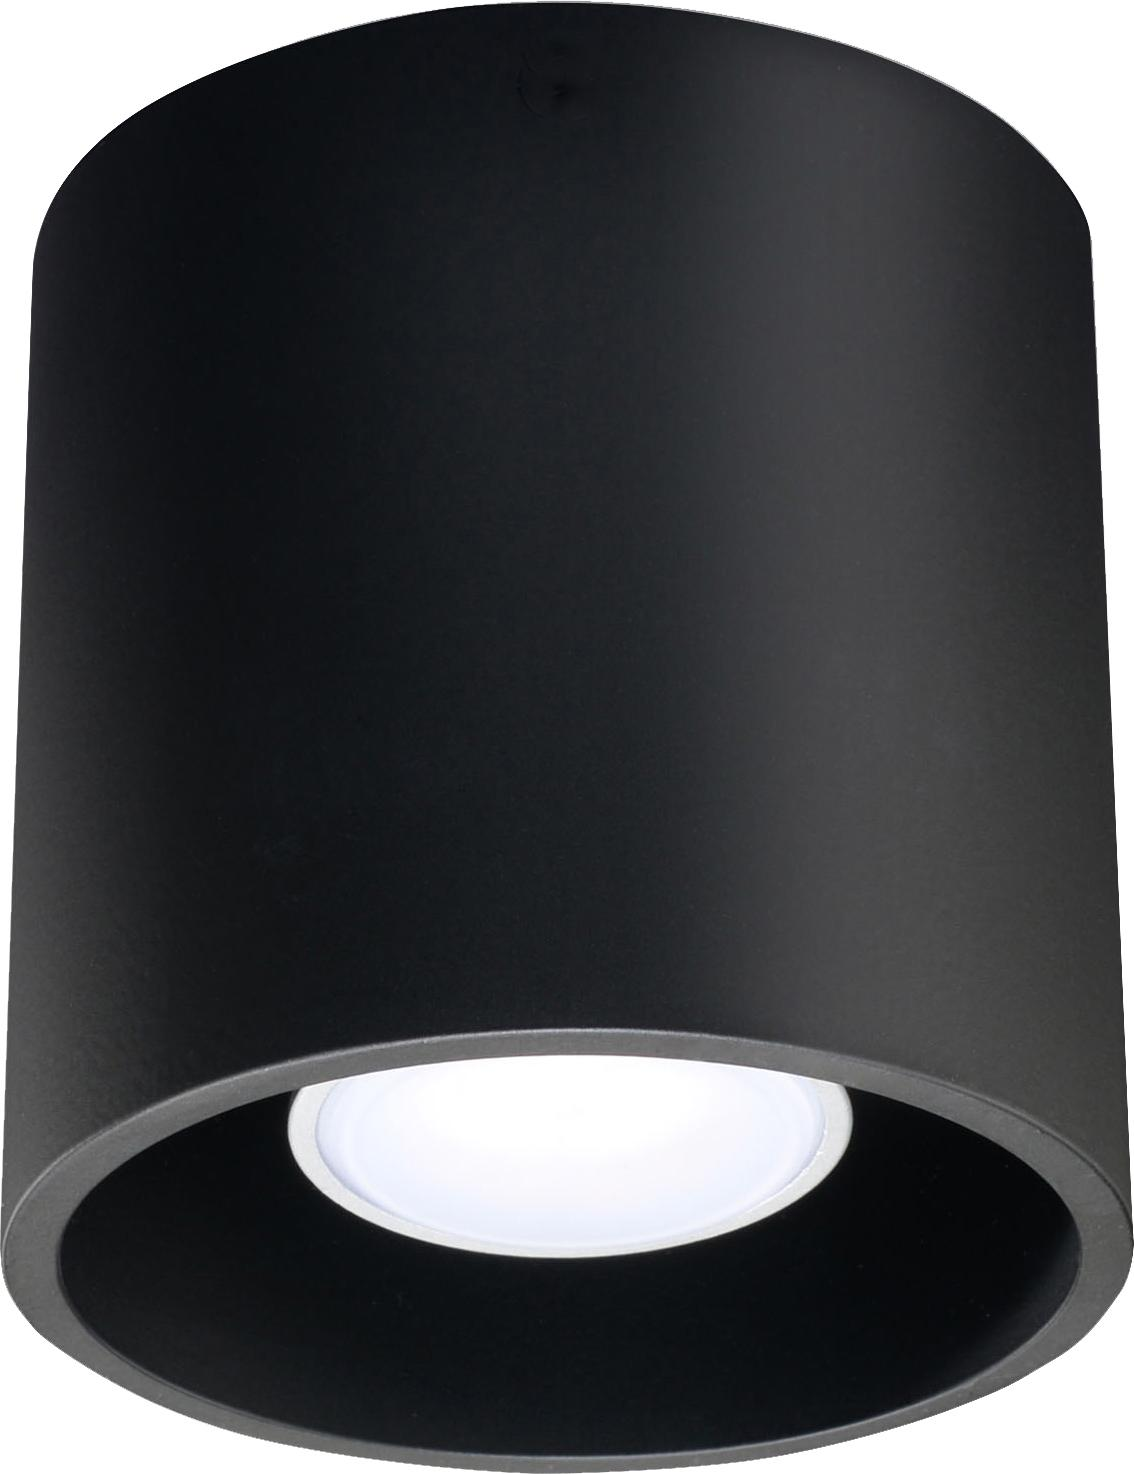 Deckenspot Roda in Schwarz, Aluminium, beschichtet, Schwarz, Ø 10 x H 10 cm